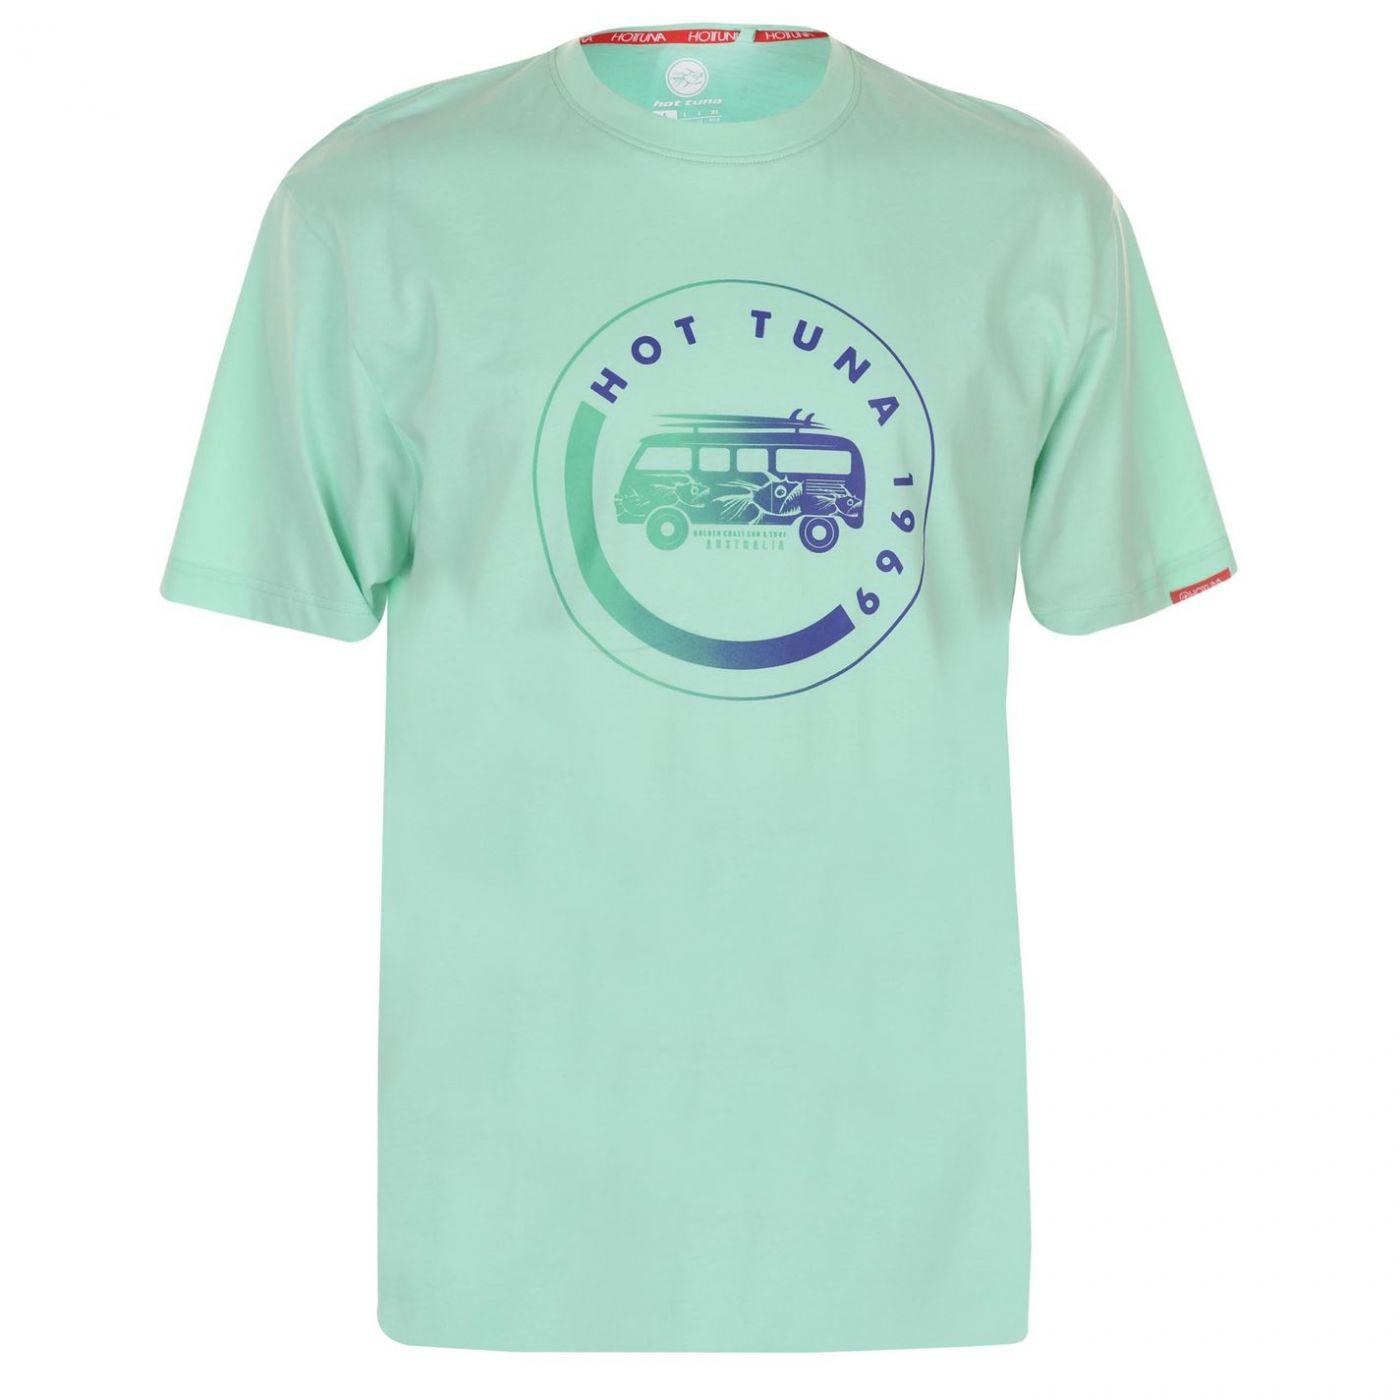 Hot Tuna Crew T Shirt Mens